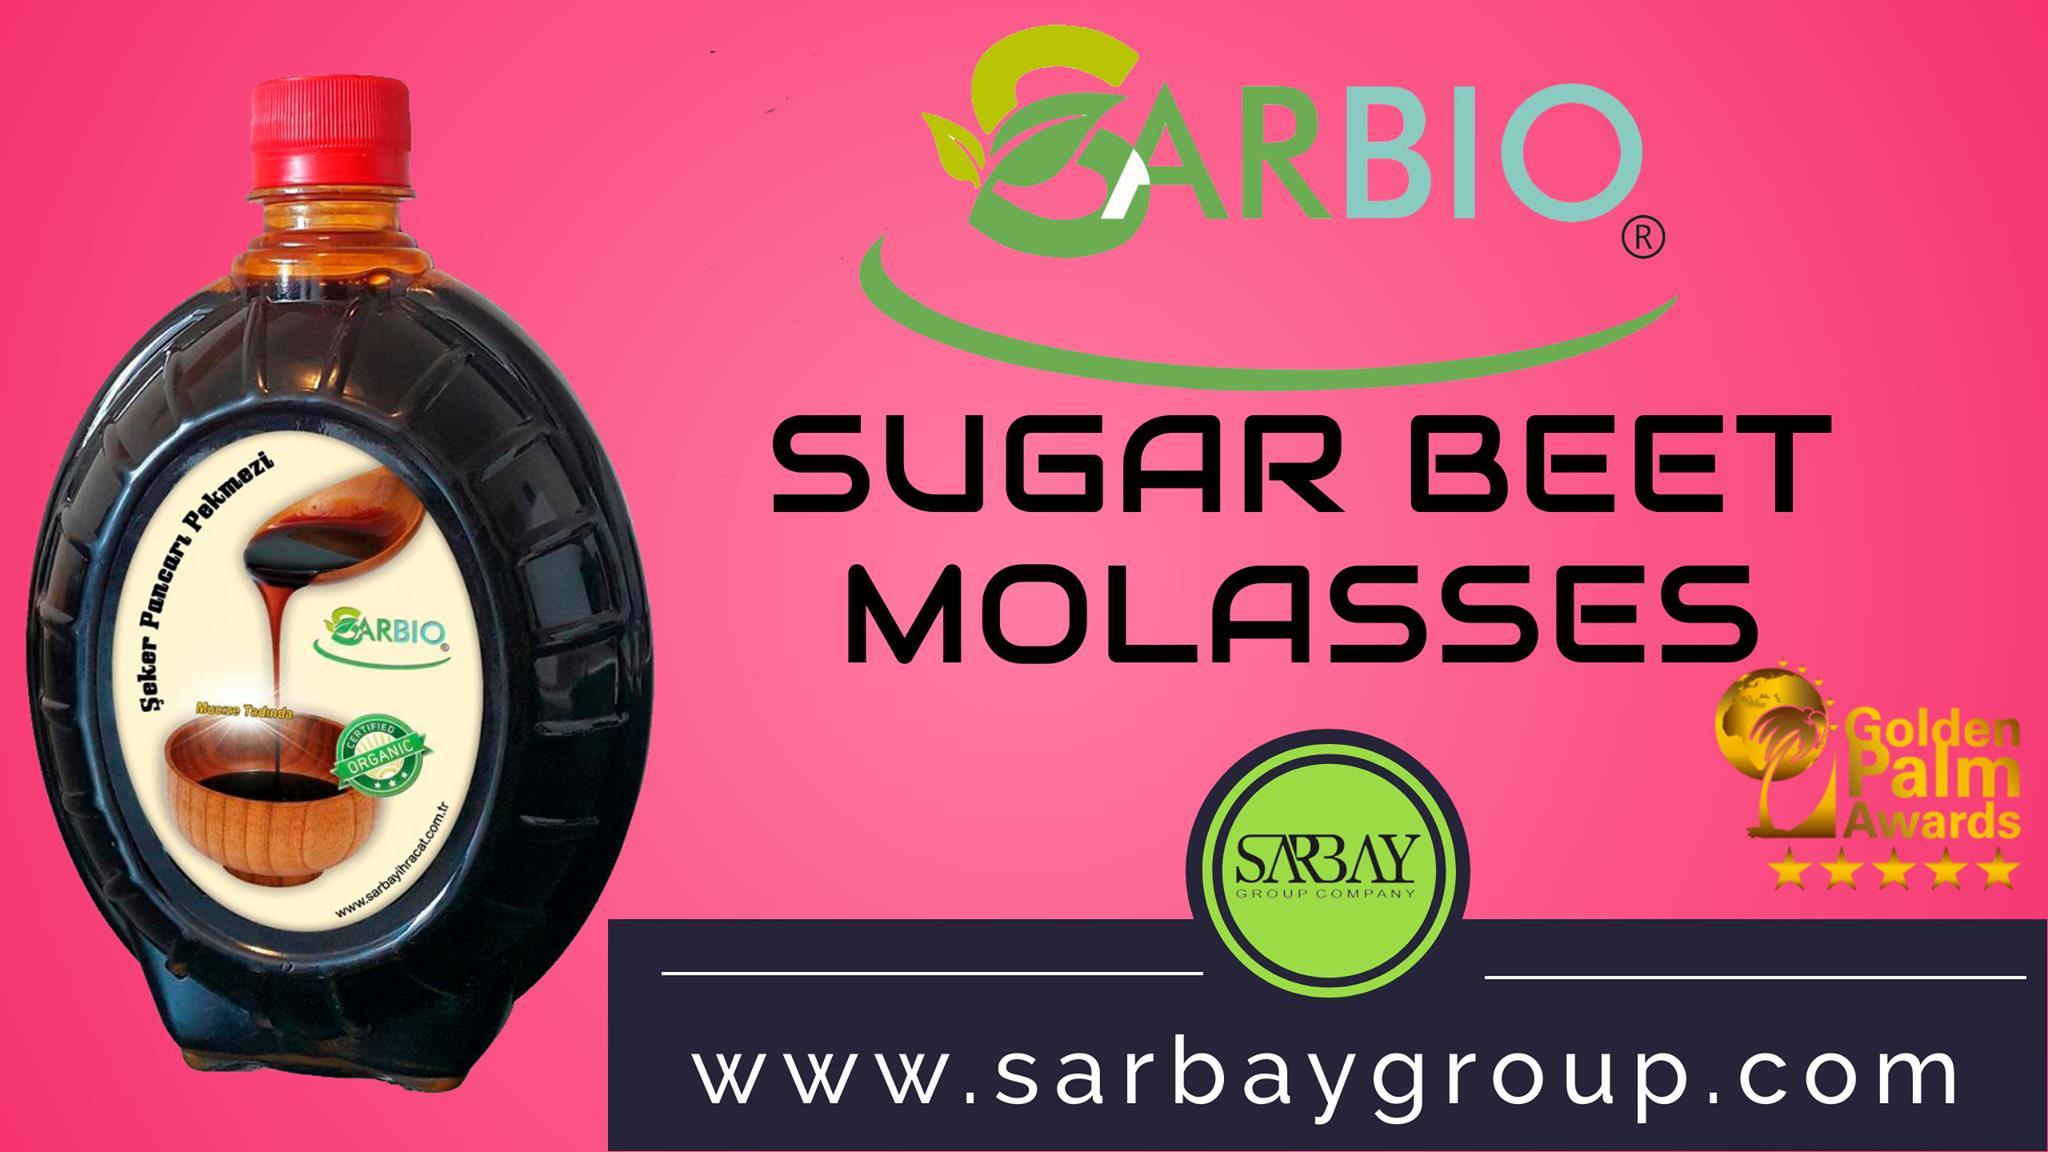 Sugar Beet Molasses